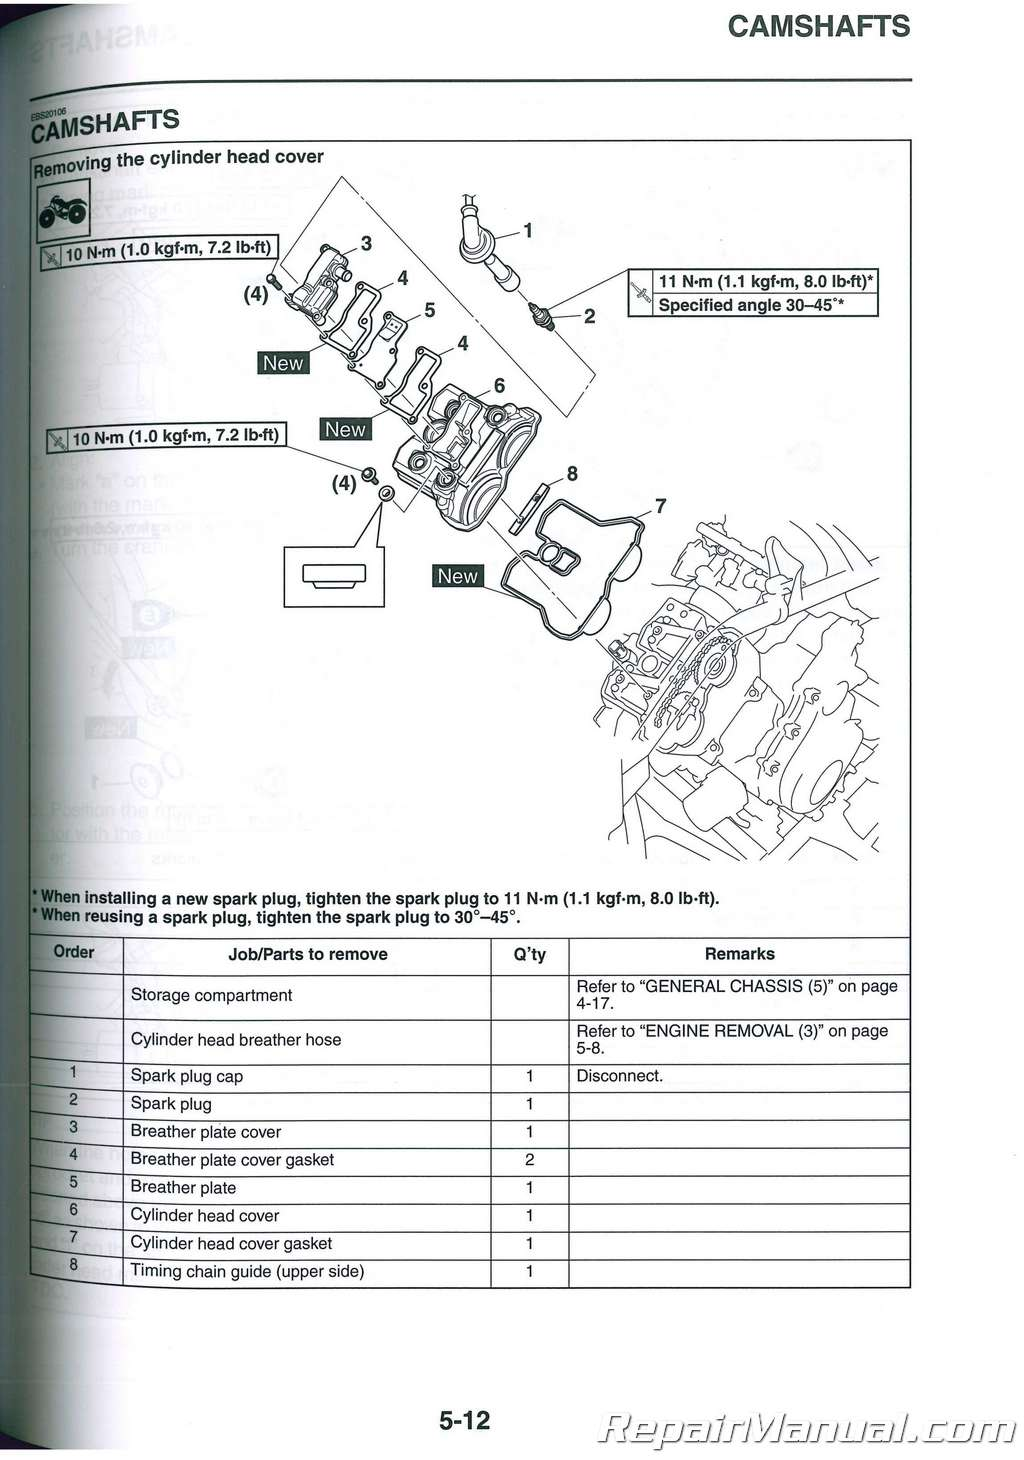 2017 – 2018 Yamaha Grizzly 700 ATV Service Manual